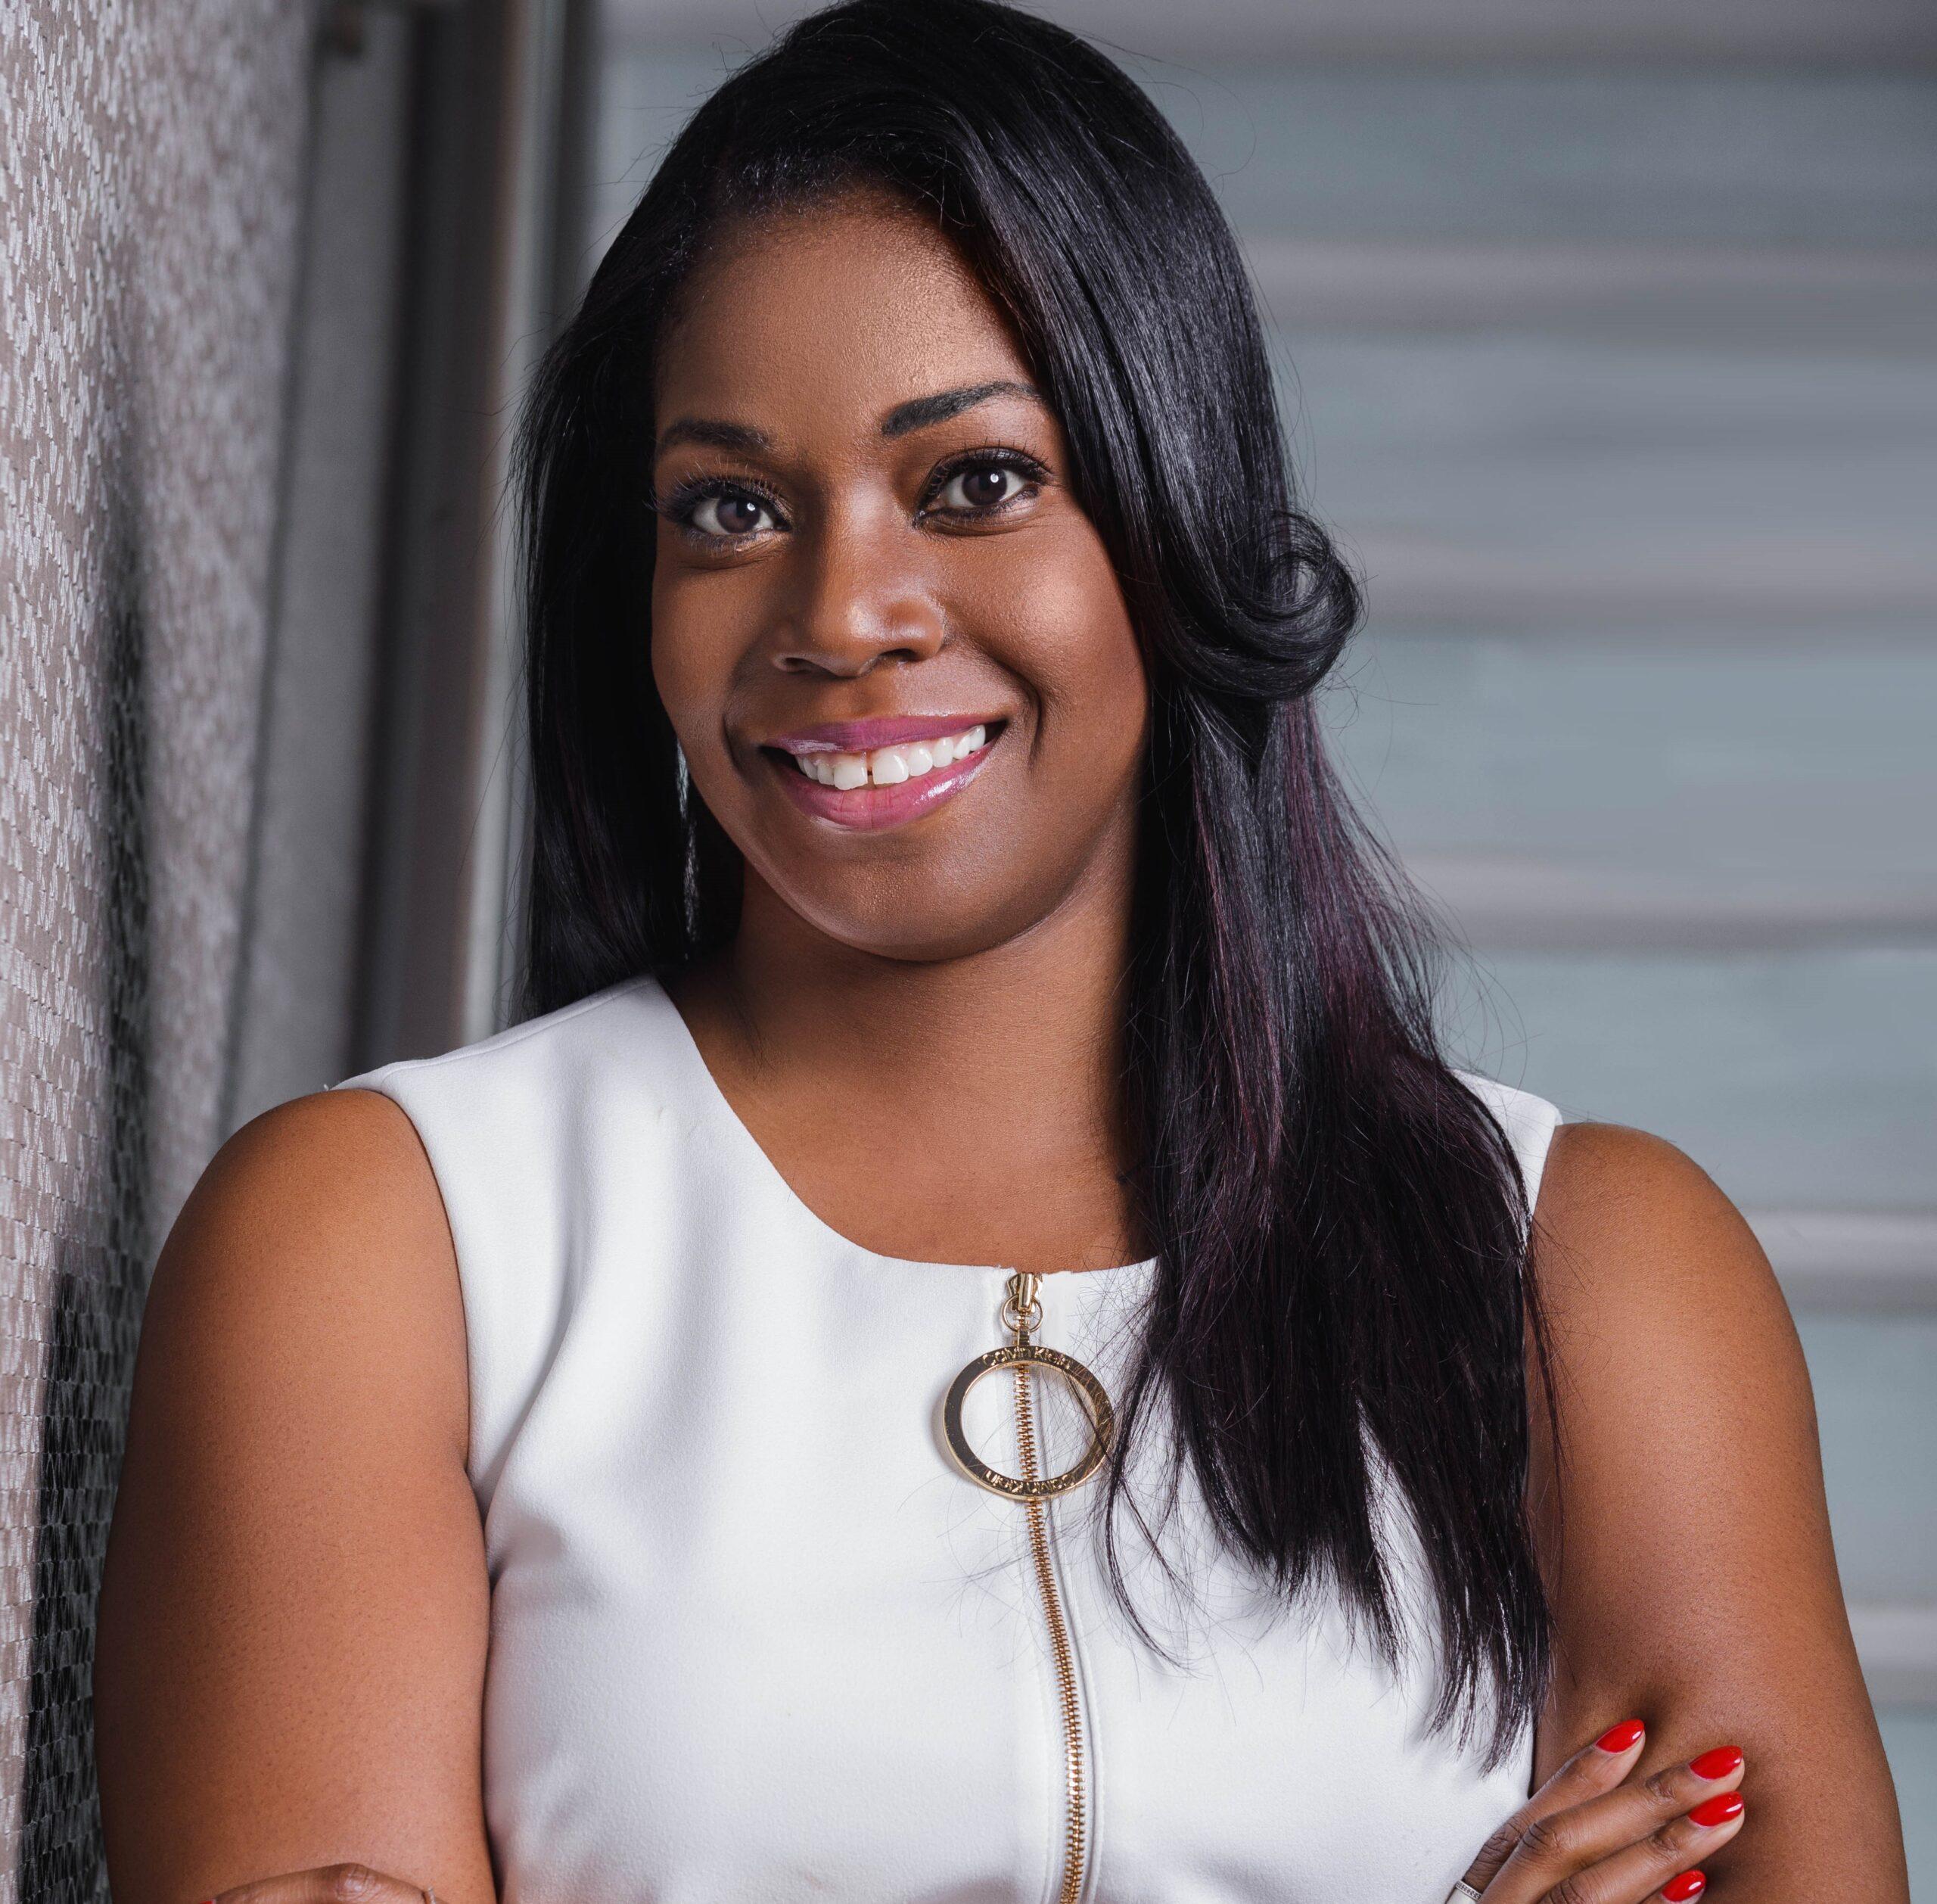 Dr. Shante P. Williams, MBA